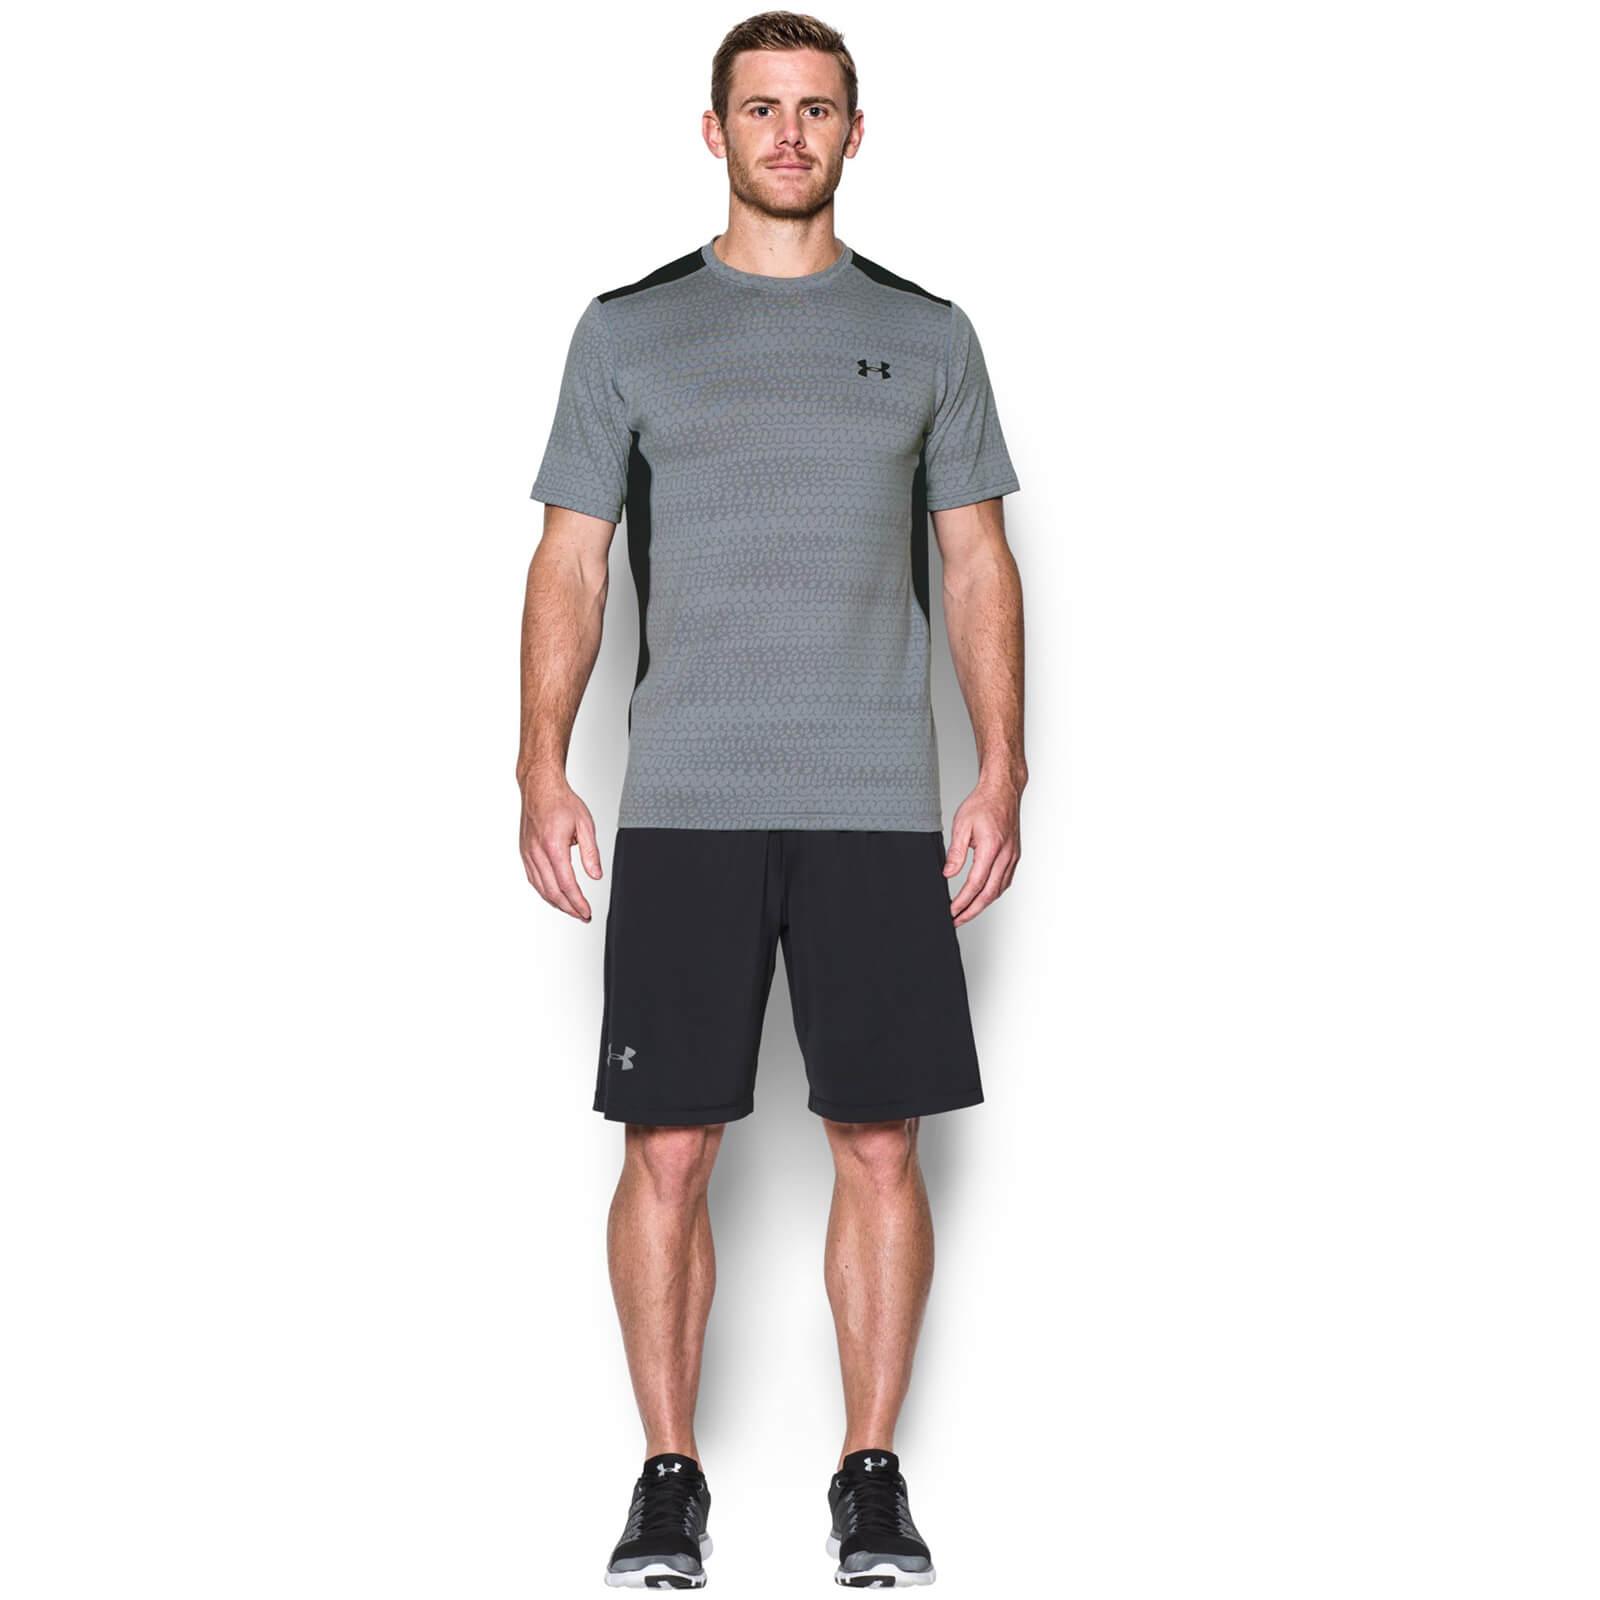 f8a3aedd Under Armour Men's Raid Jacquard T-Shirt - Steel/Graphite Sports & Leisure  | TheHut.com